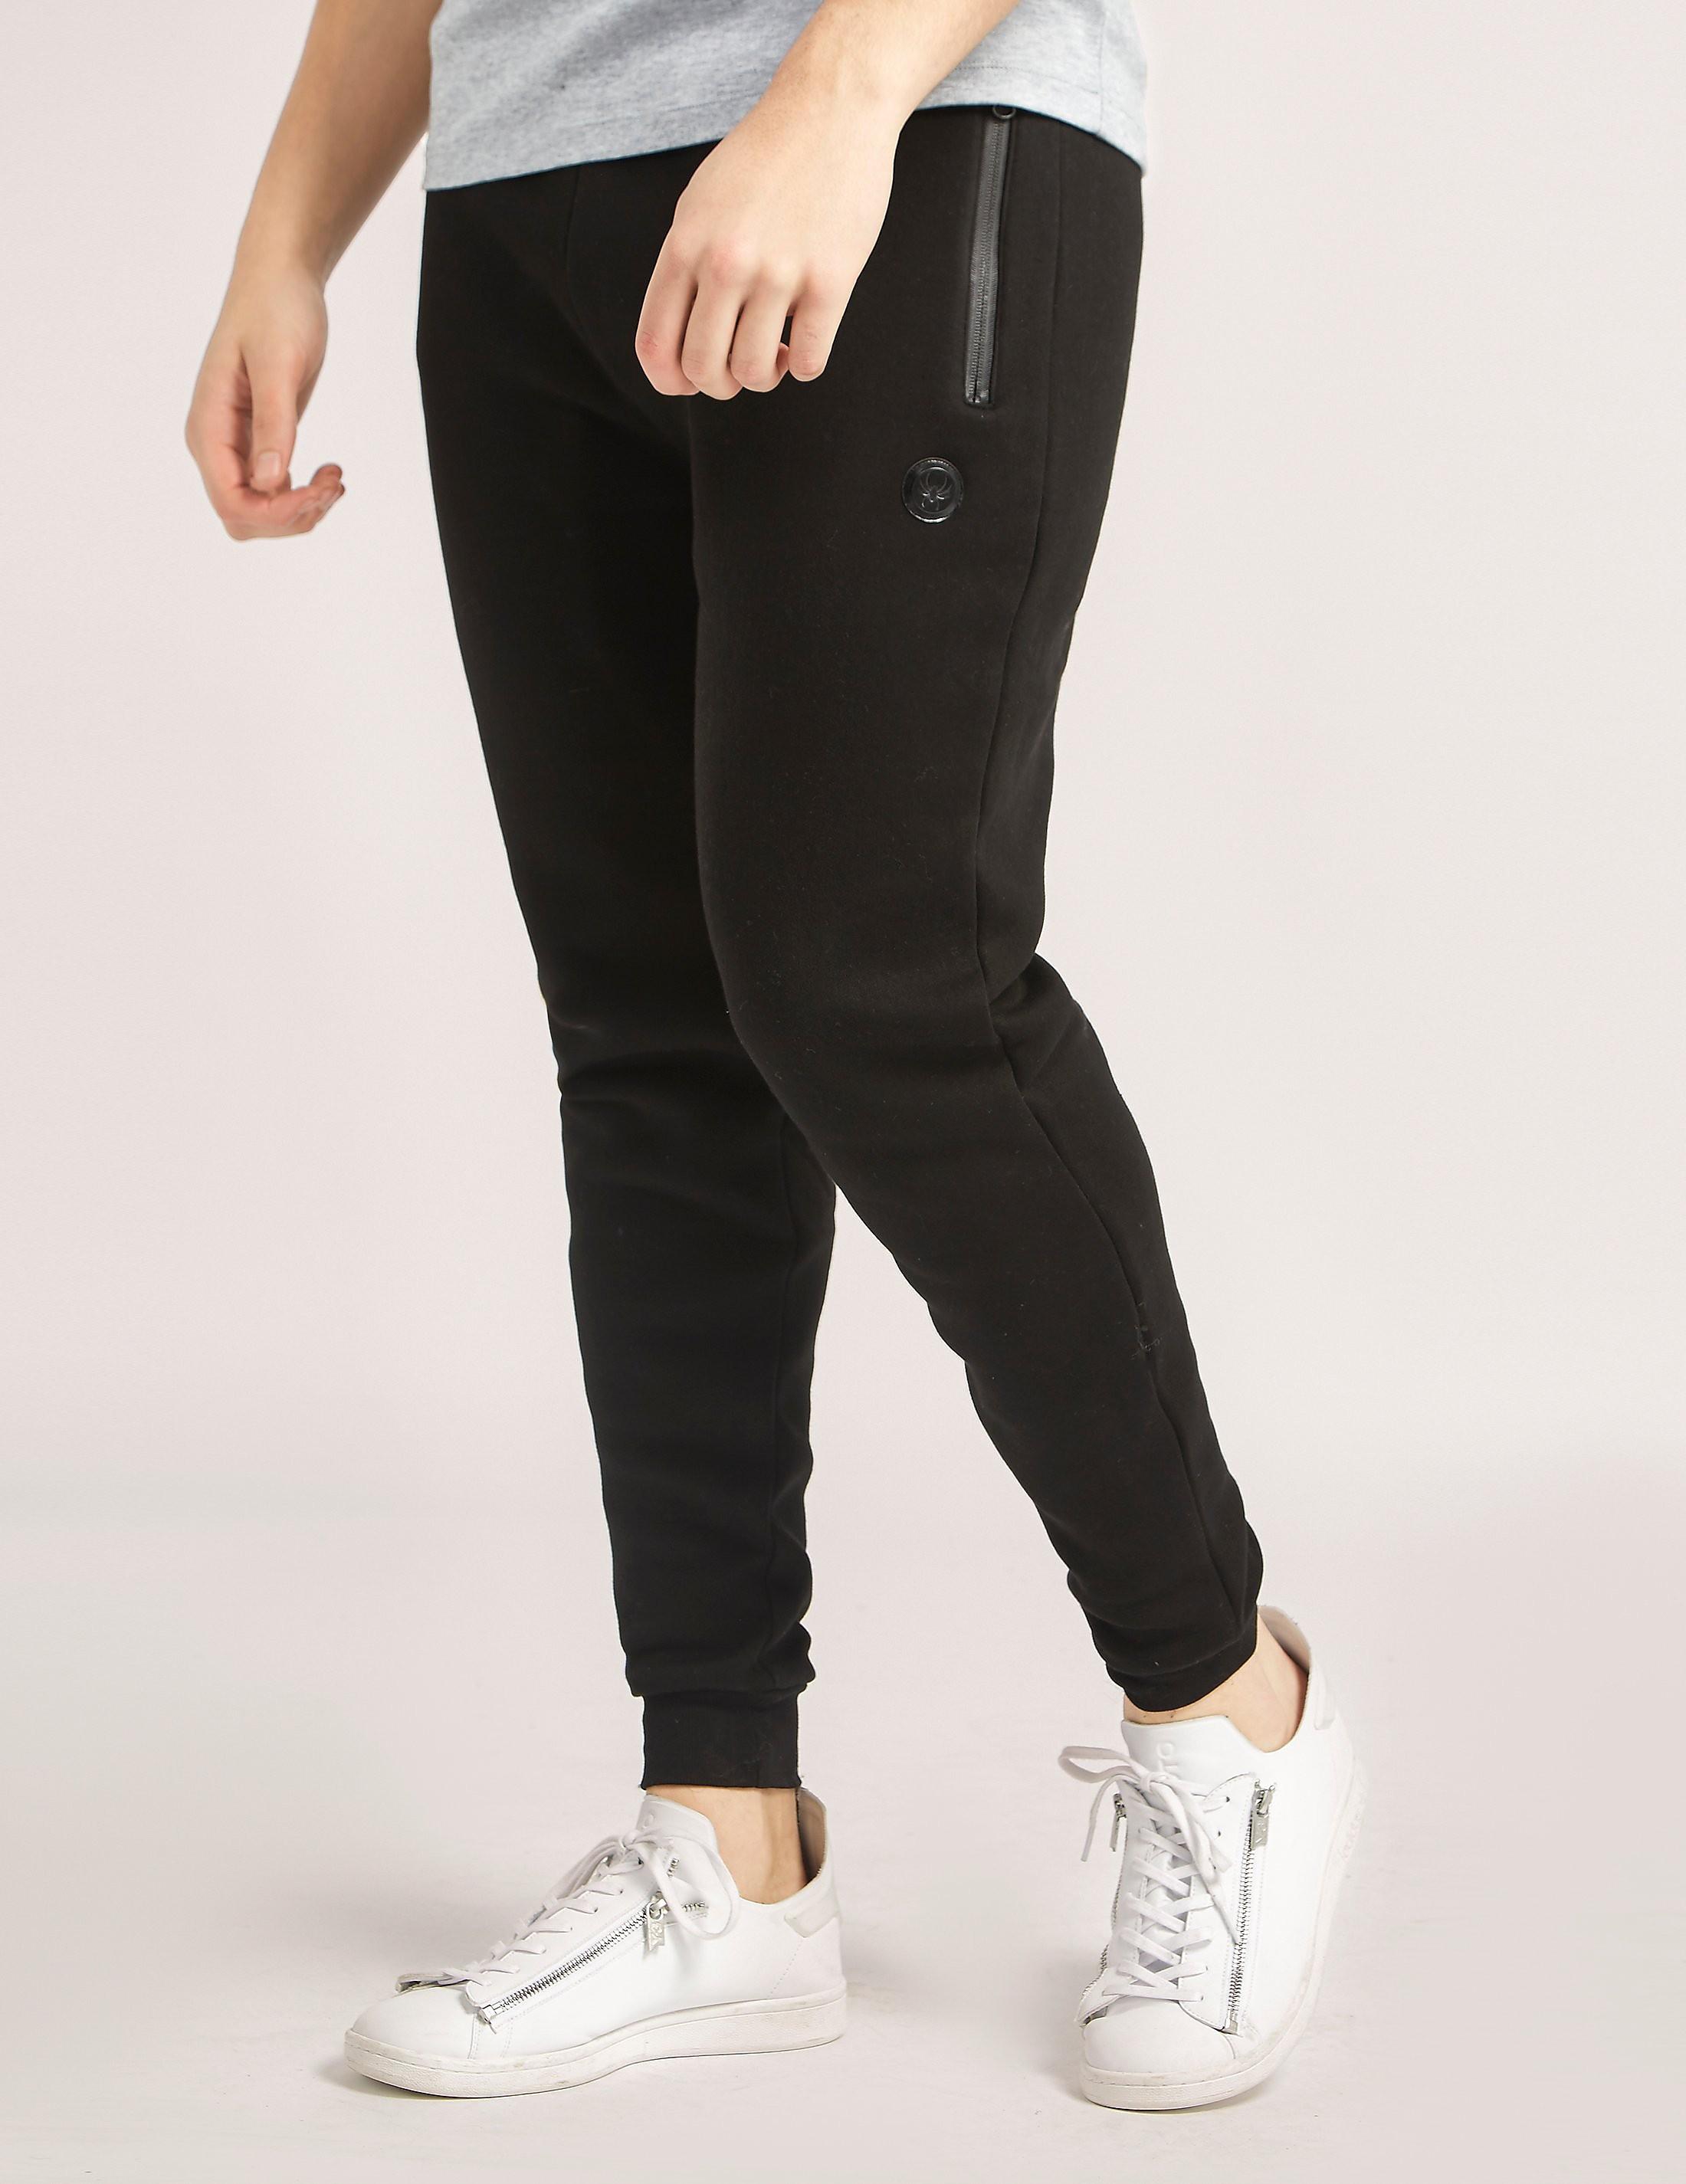 Intense Clothing Widow Pin Track Pants